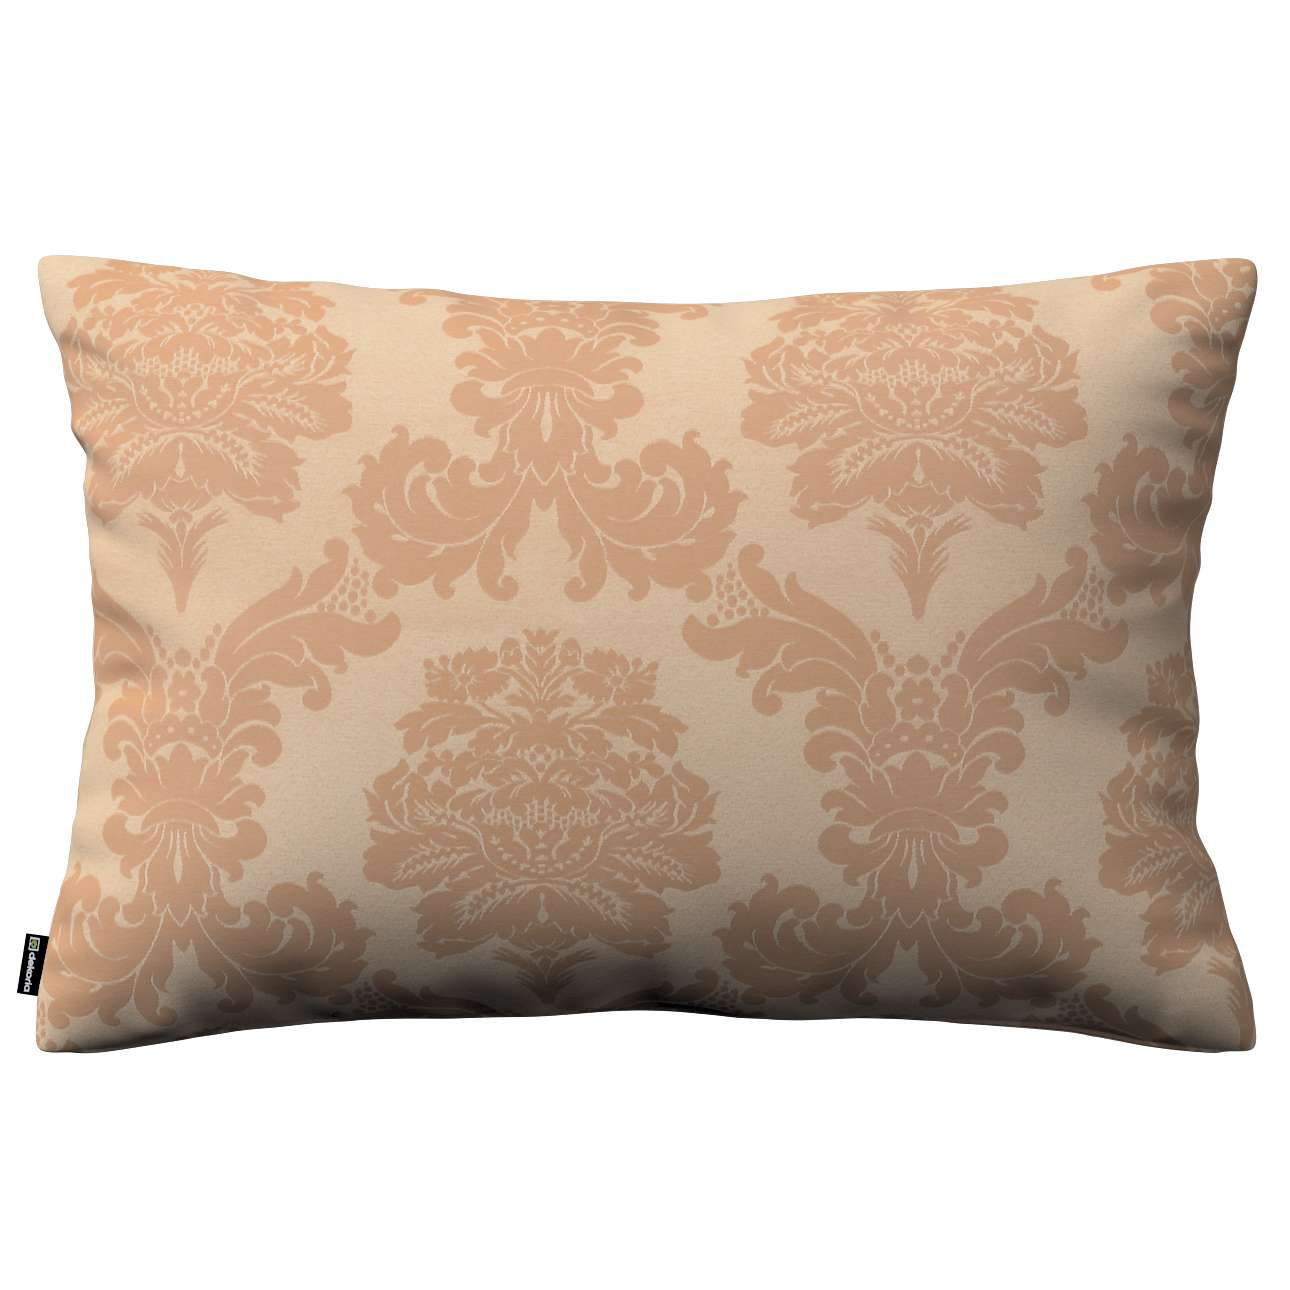 kissenh lle kinga 60x40cm hellbraun dekoria. Black Bedroom Furniture Sets. Home Design Ideas